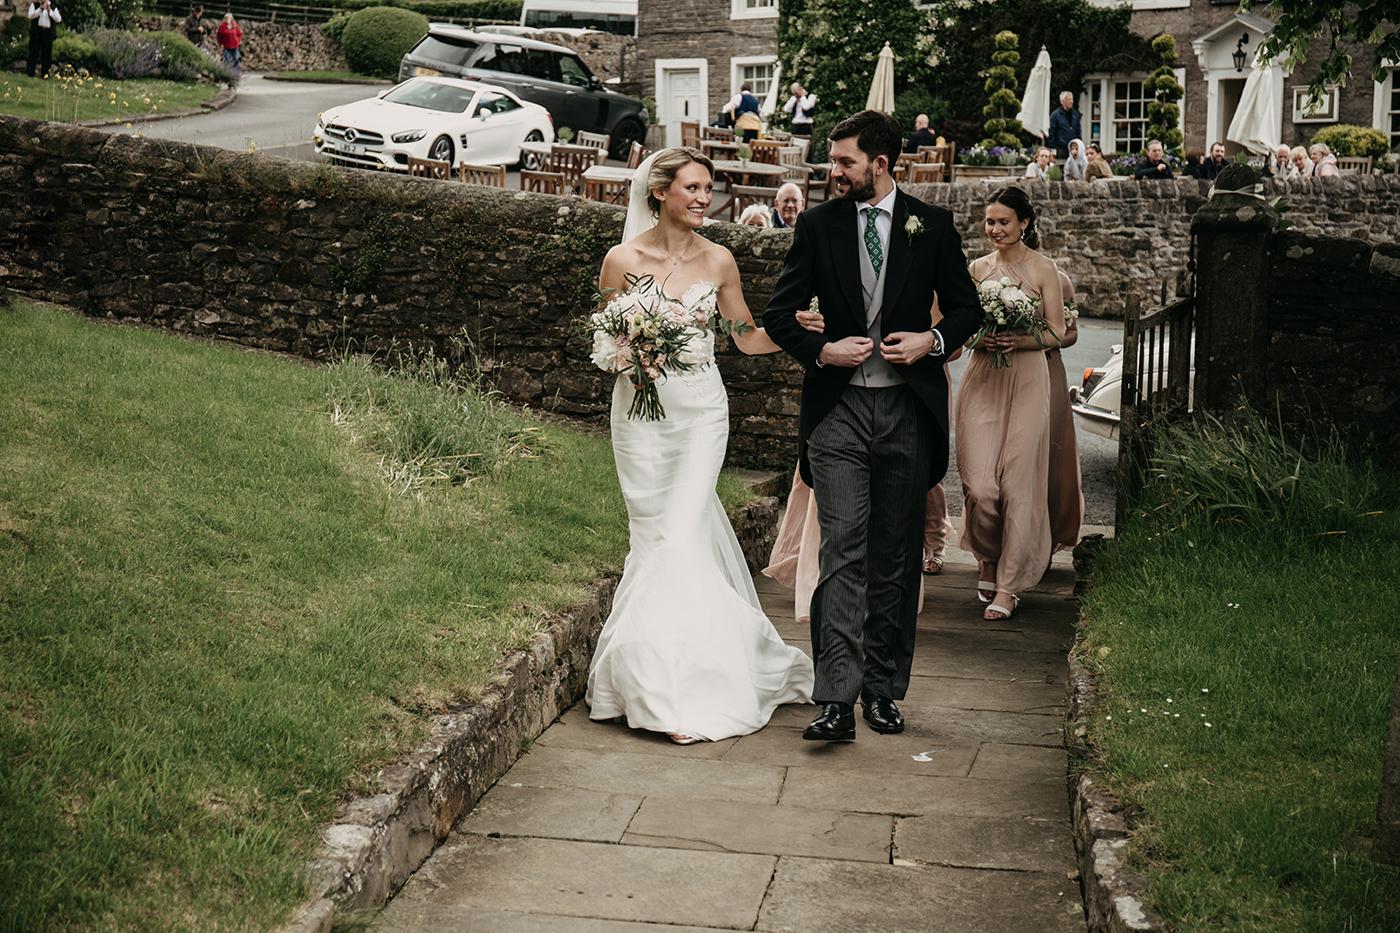 downham lancashire wedding photographer